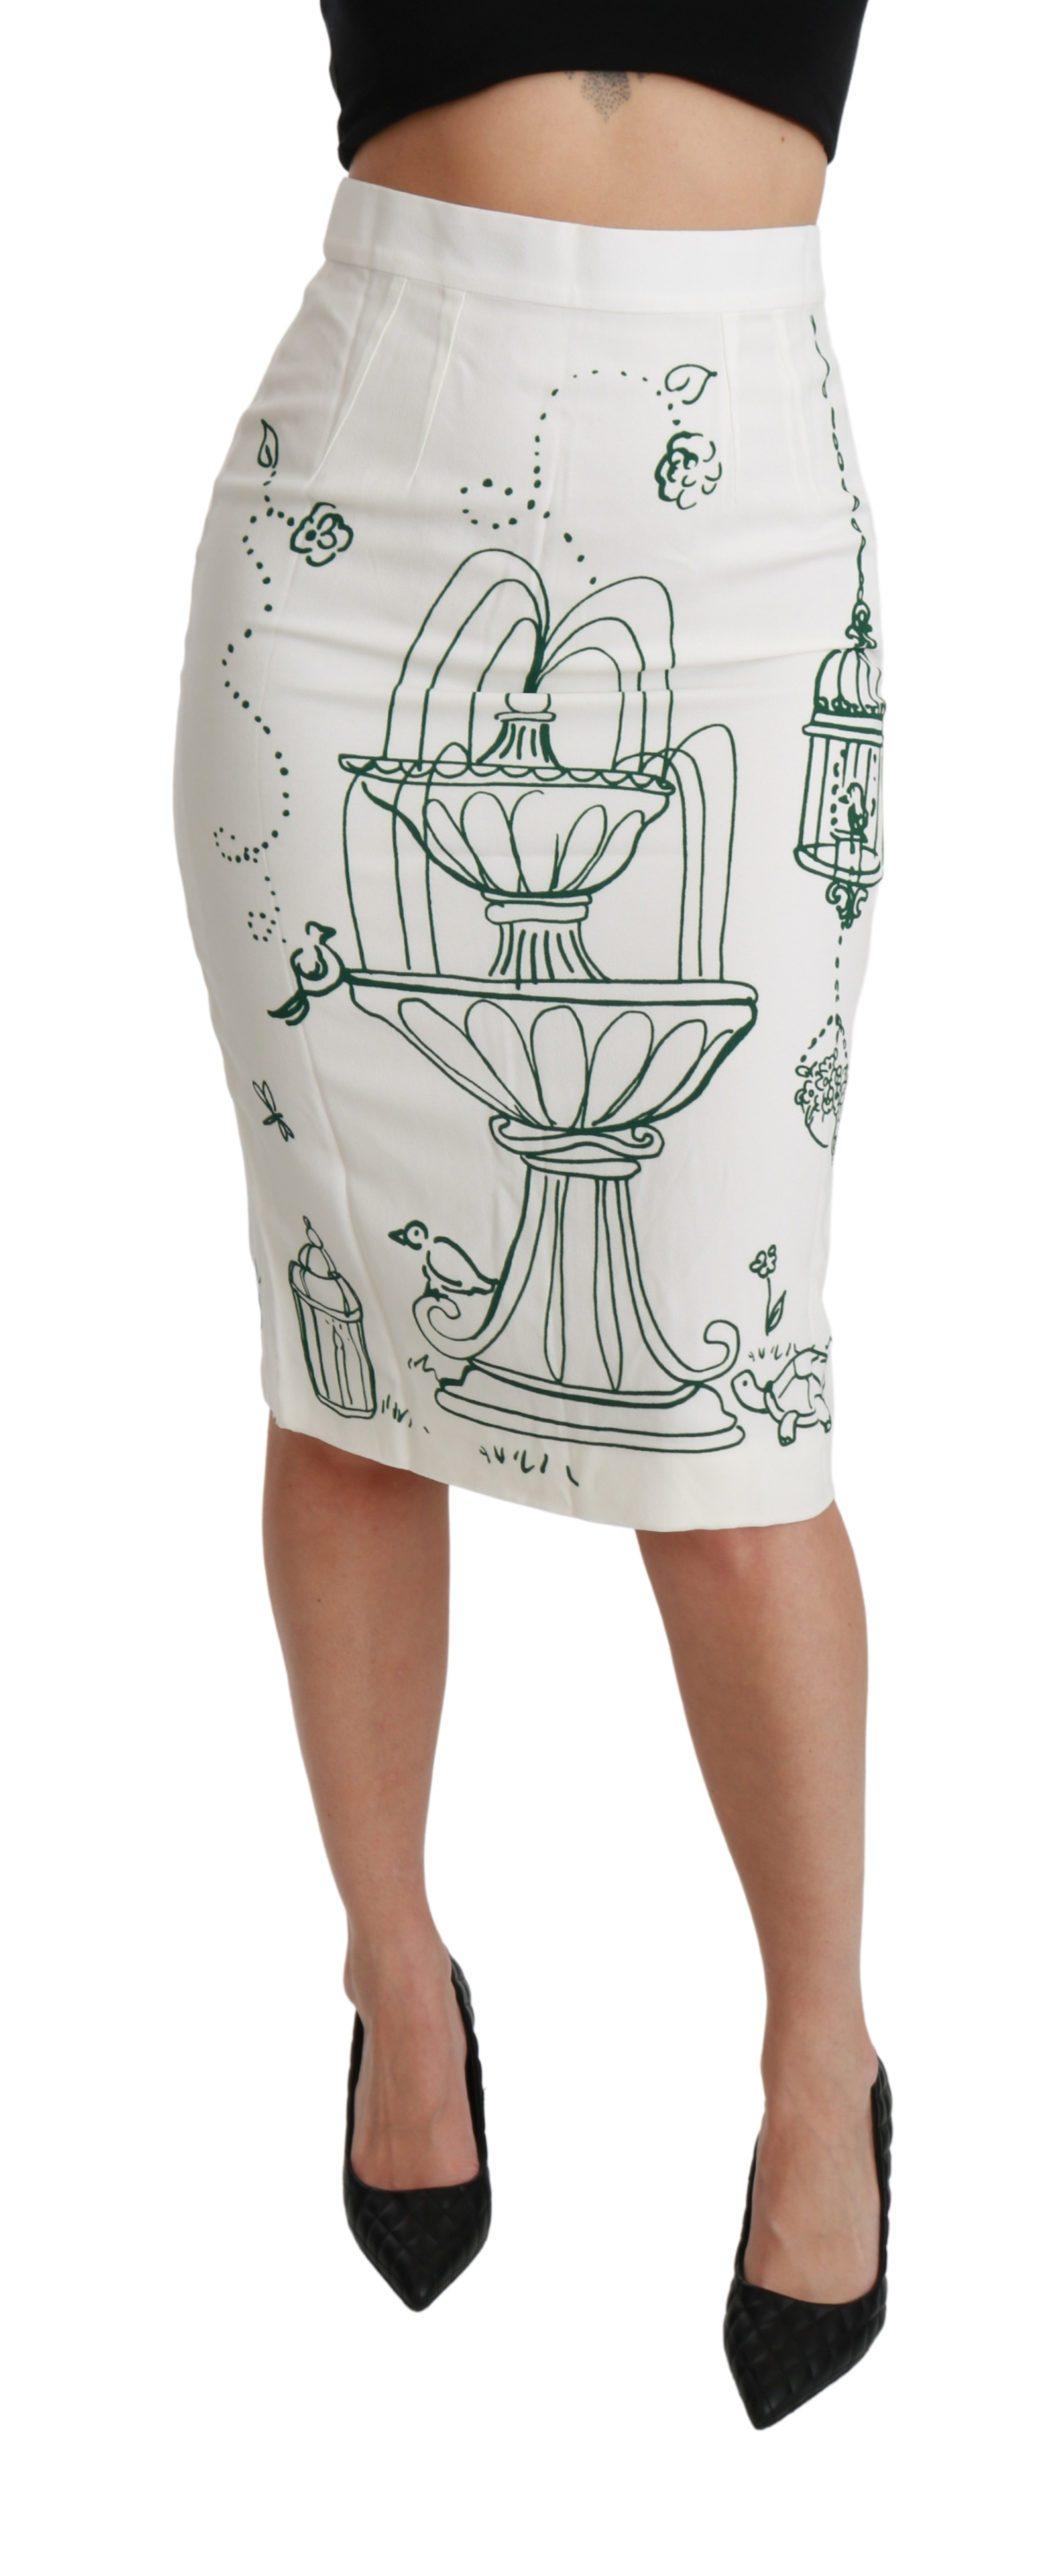 Dolce & Gabbana Women's Fairy Tale Print Stretch White Skirt Green SKI1435 - IT38|XS